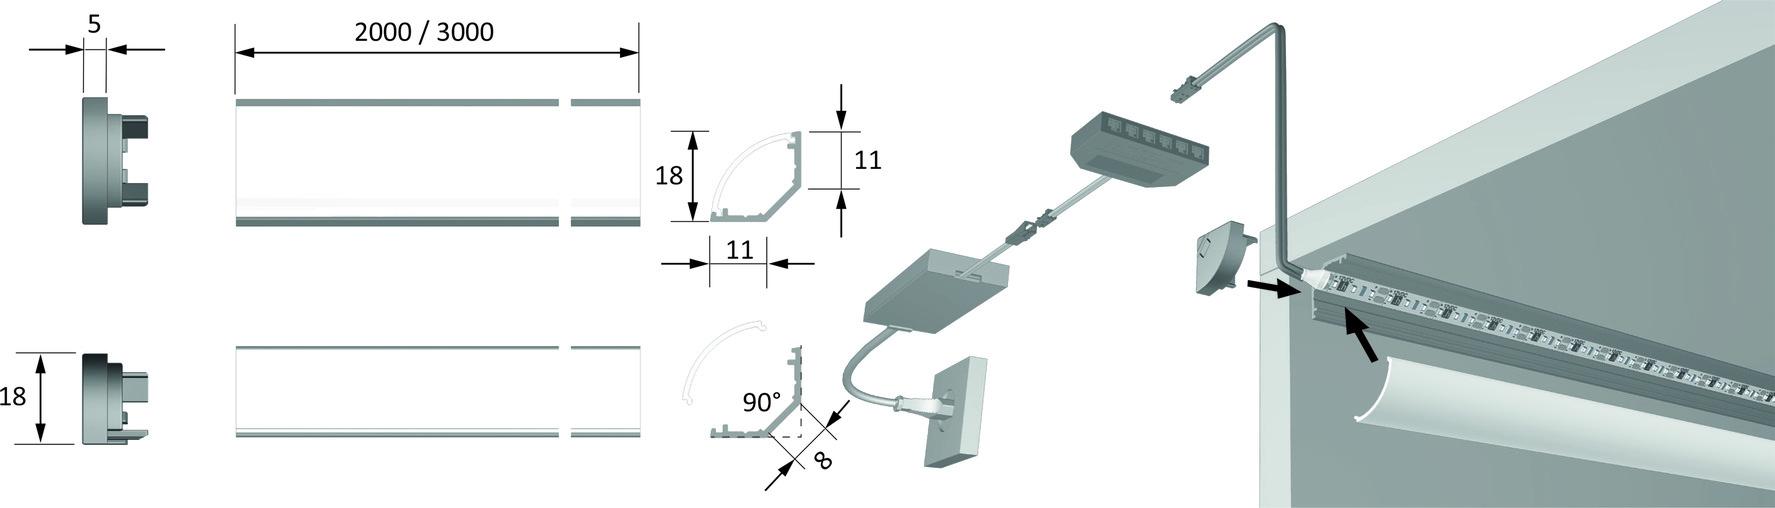 LED Anbauprofile HALEMEIER ChannelLine H 45° mit Lichtblende